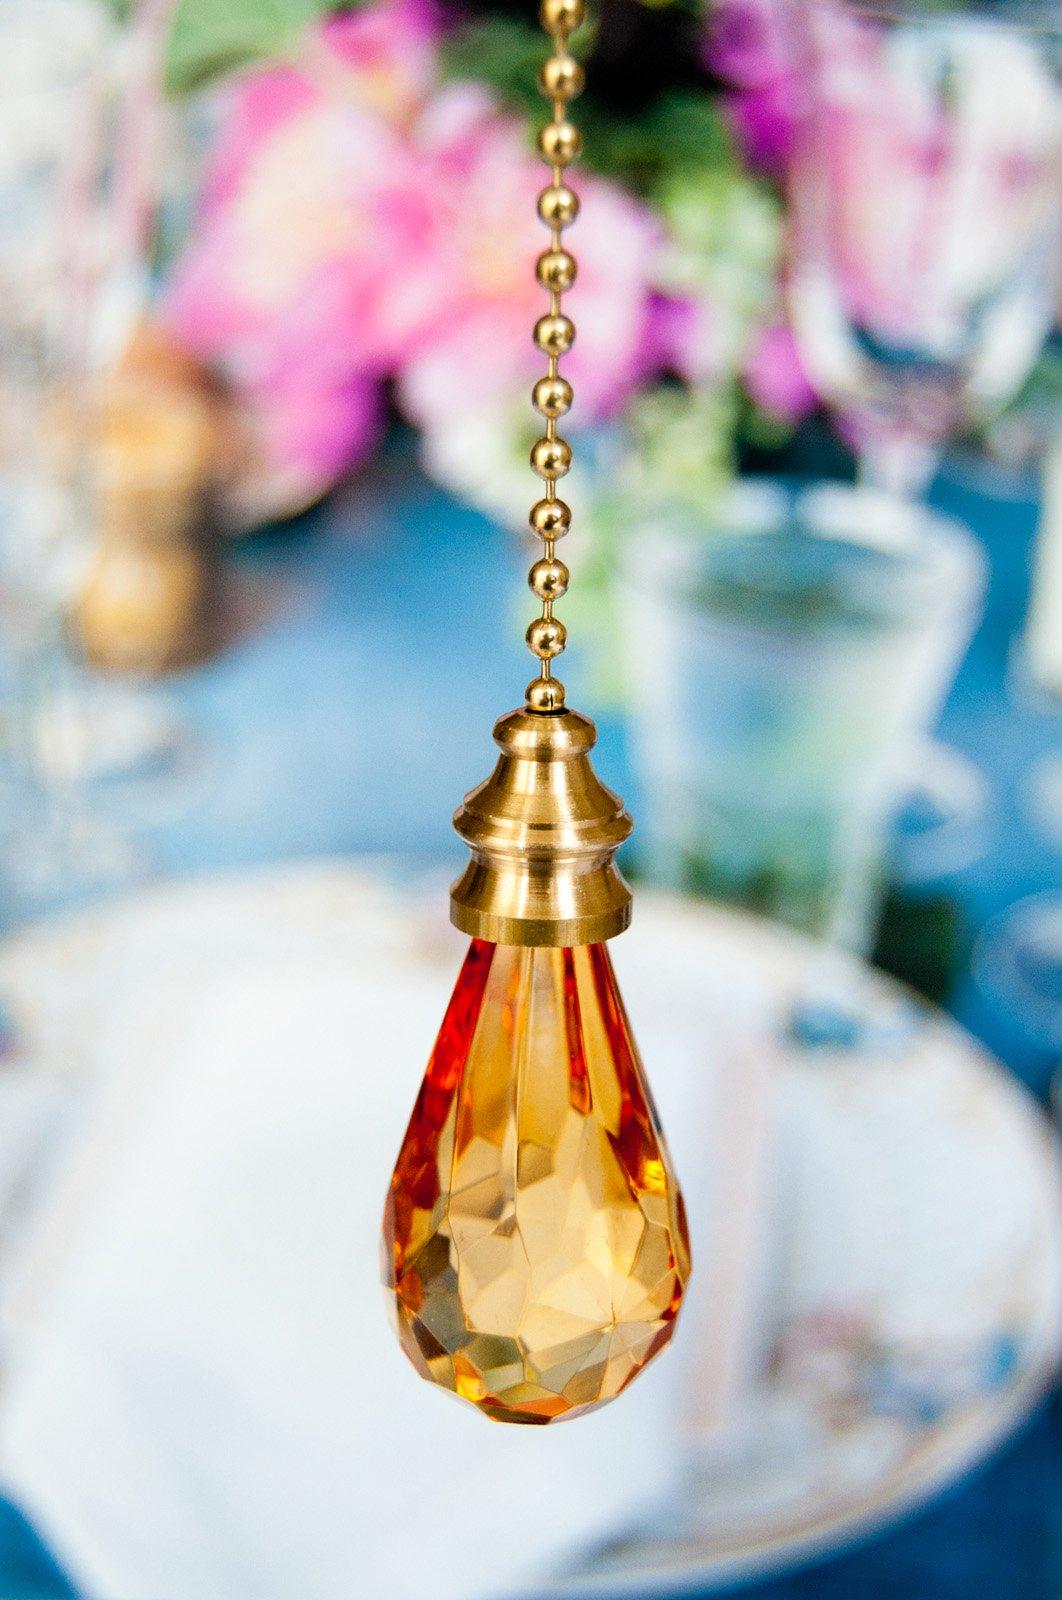 2 of Gorgeous Amber Crystal Rain Drop Ceiling Lighting Fan Pulls